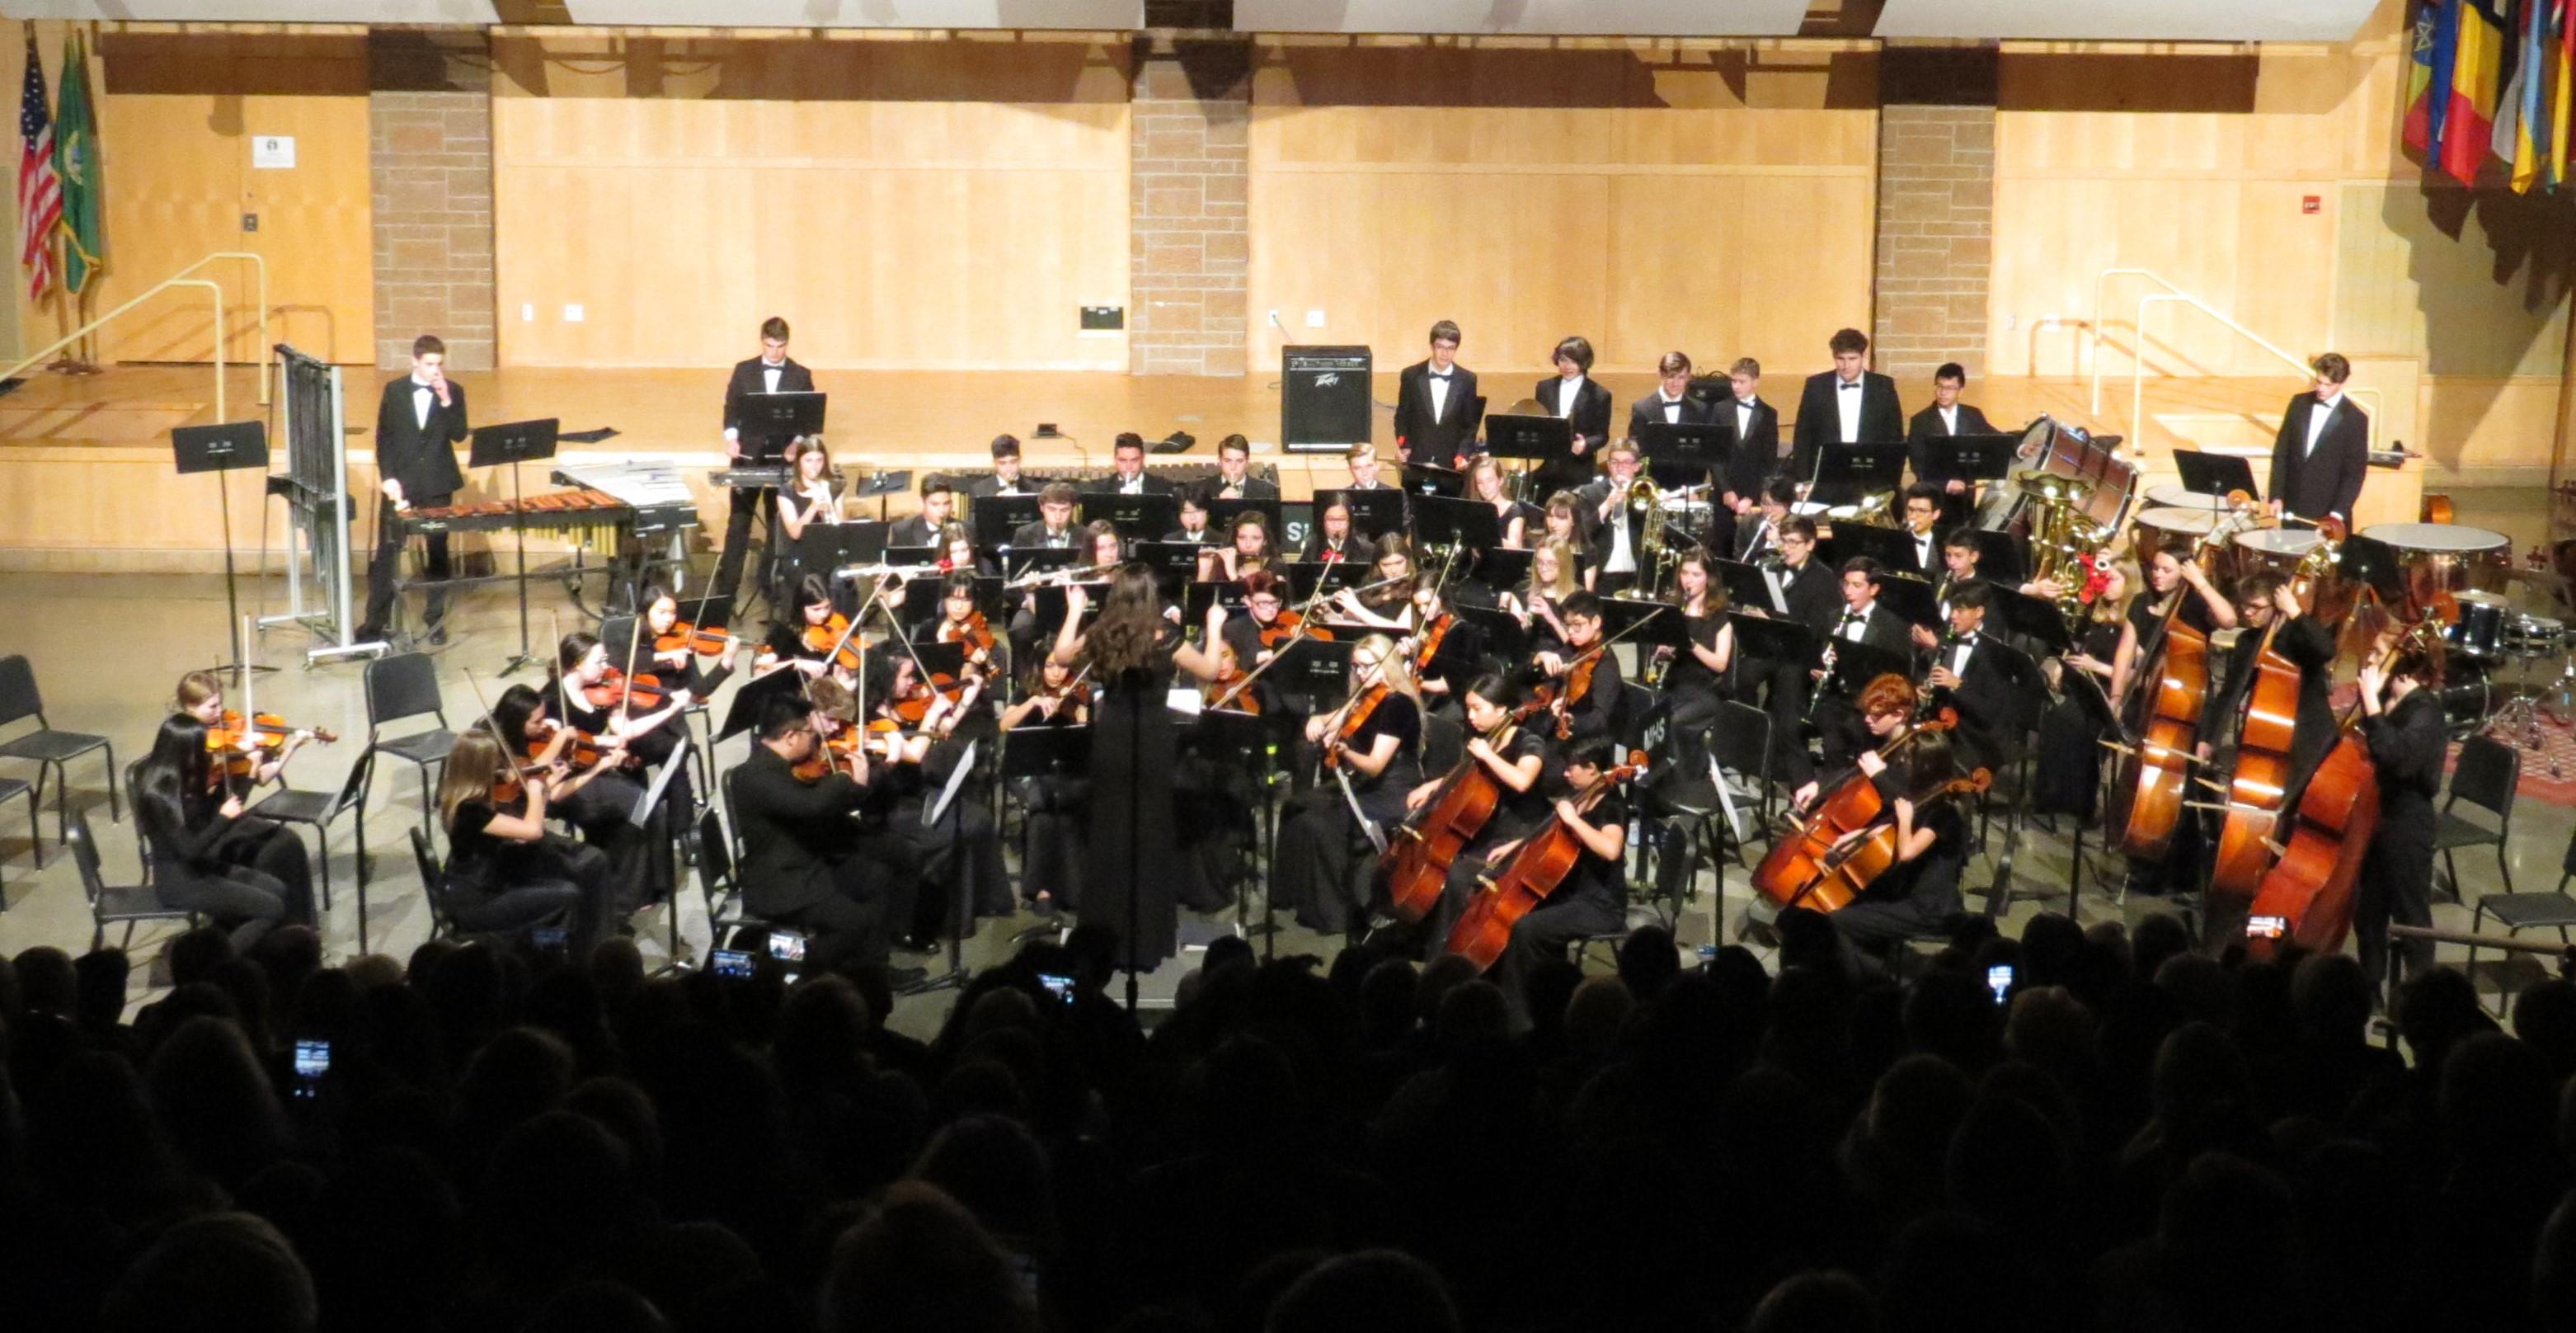 IMG_6052 - Full Orchestra